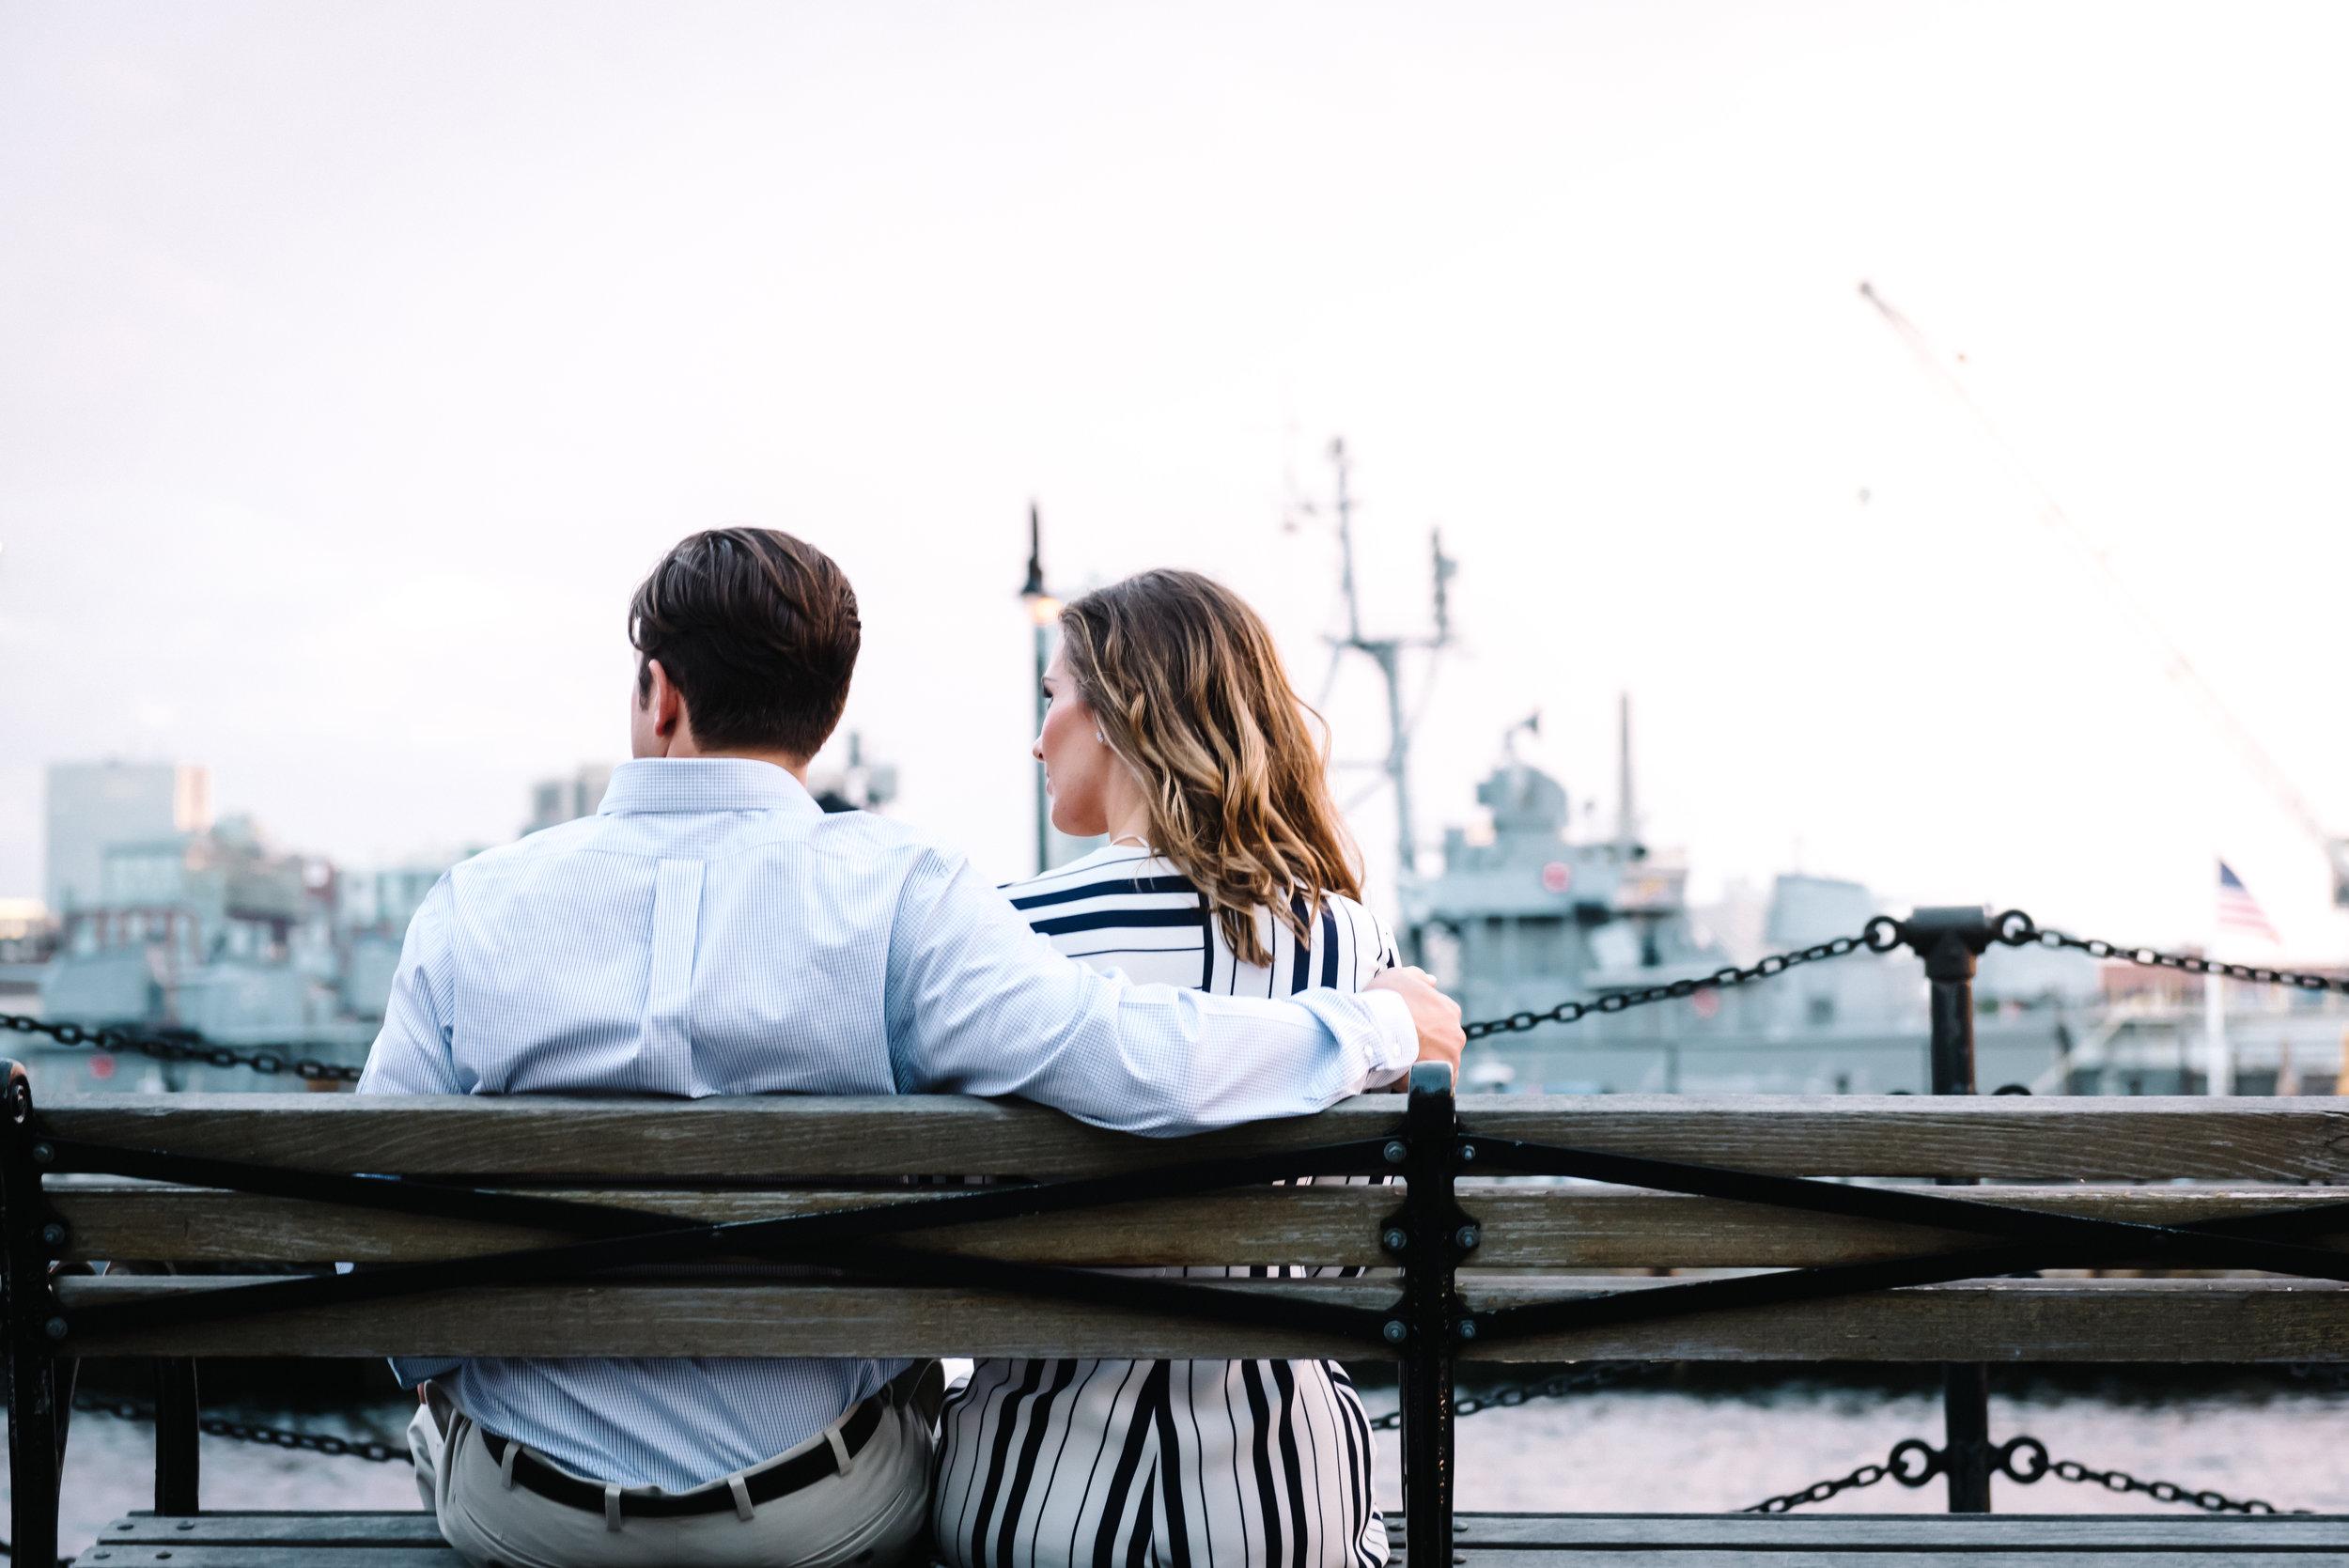 Cricket online dating Ian Somerhalder en Nina Dobrev dating weer 2014